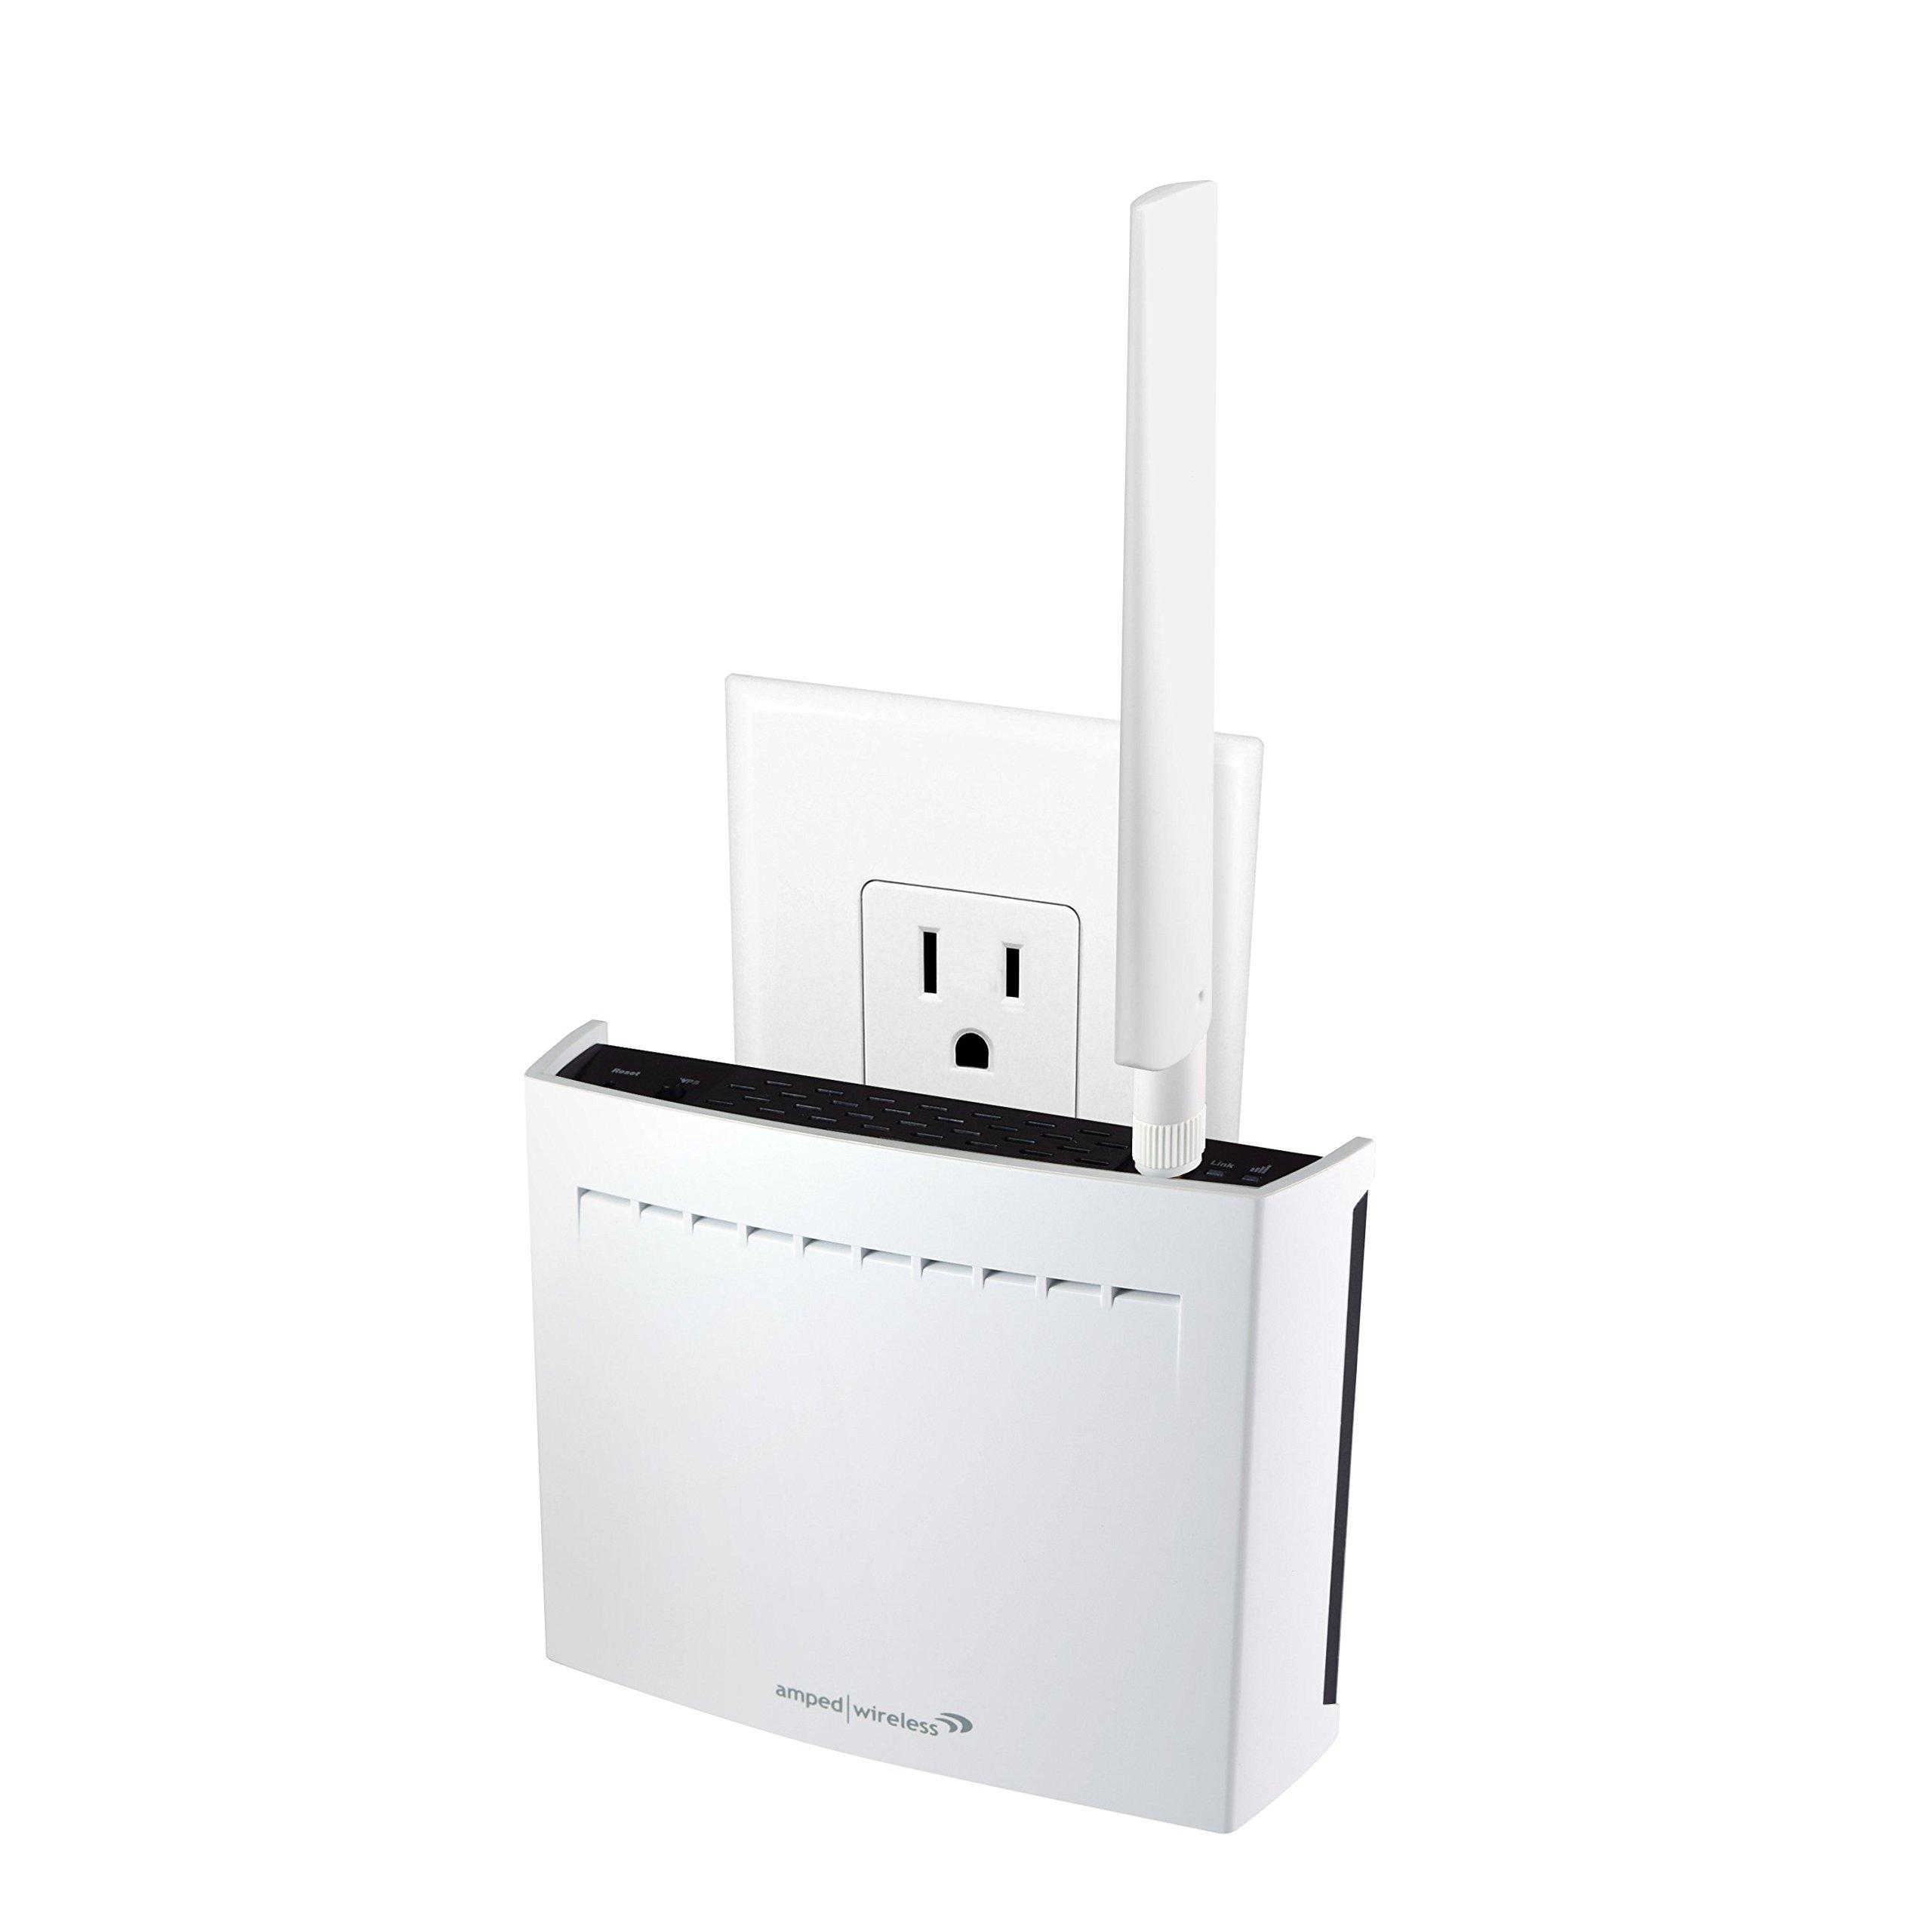 Amped Wireless REC33A-R High Power AC1750 Plug-In Wi-Fi Range Extender (Refurbished)